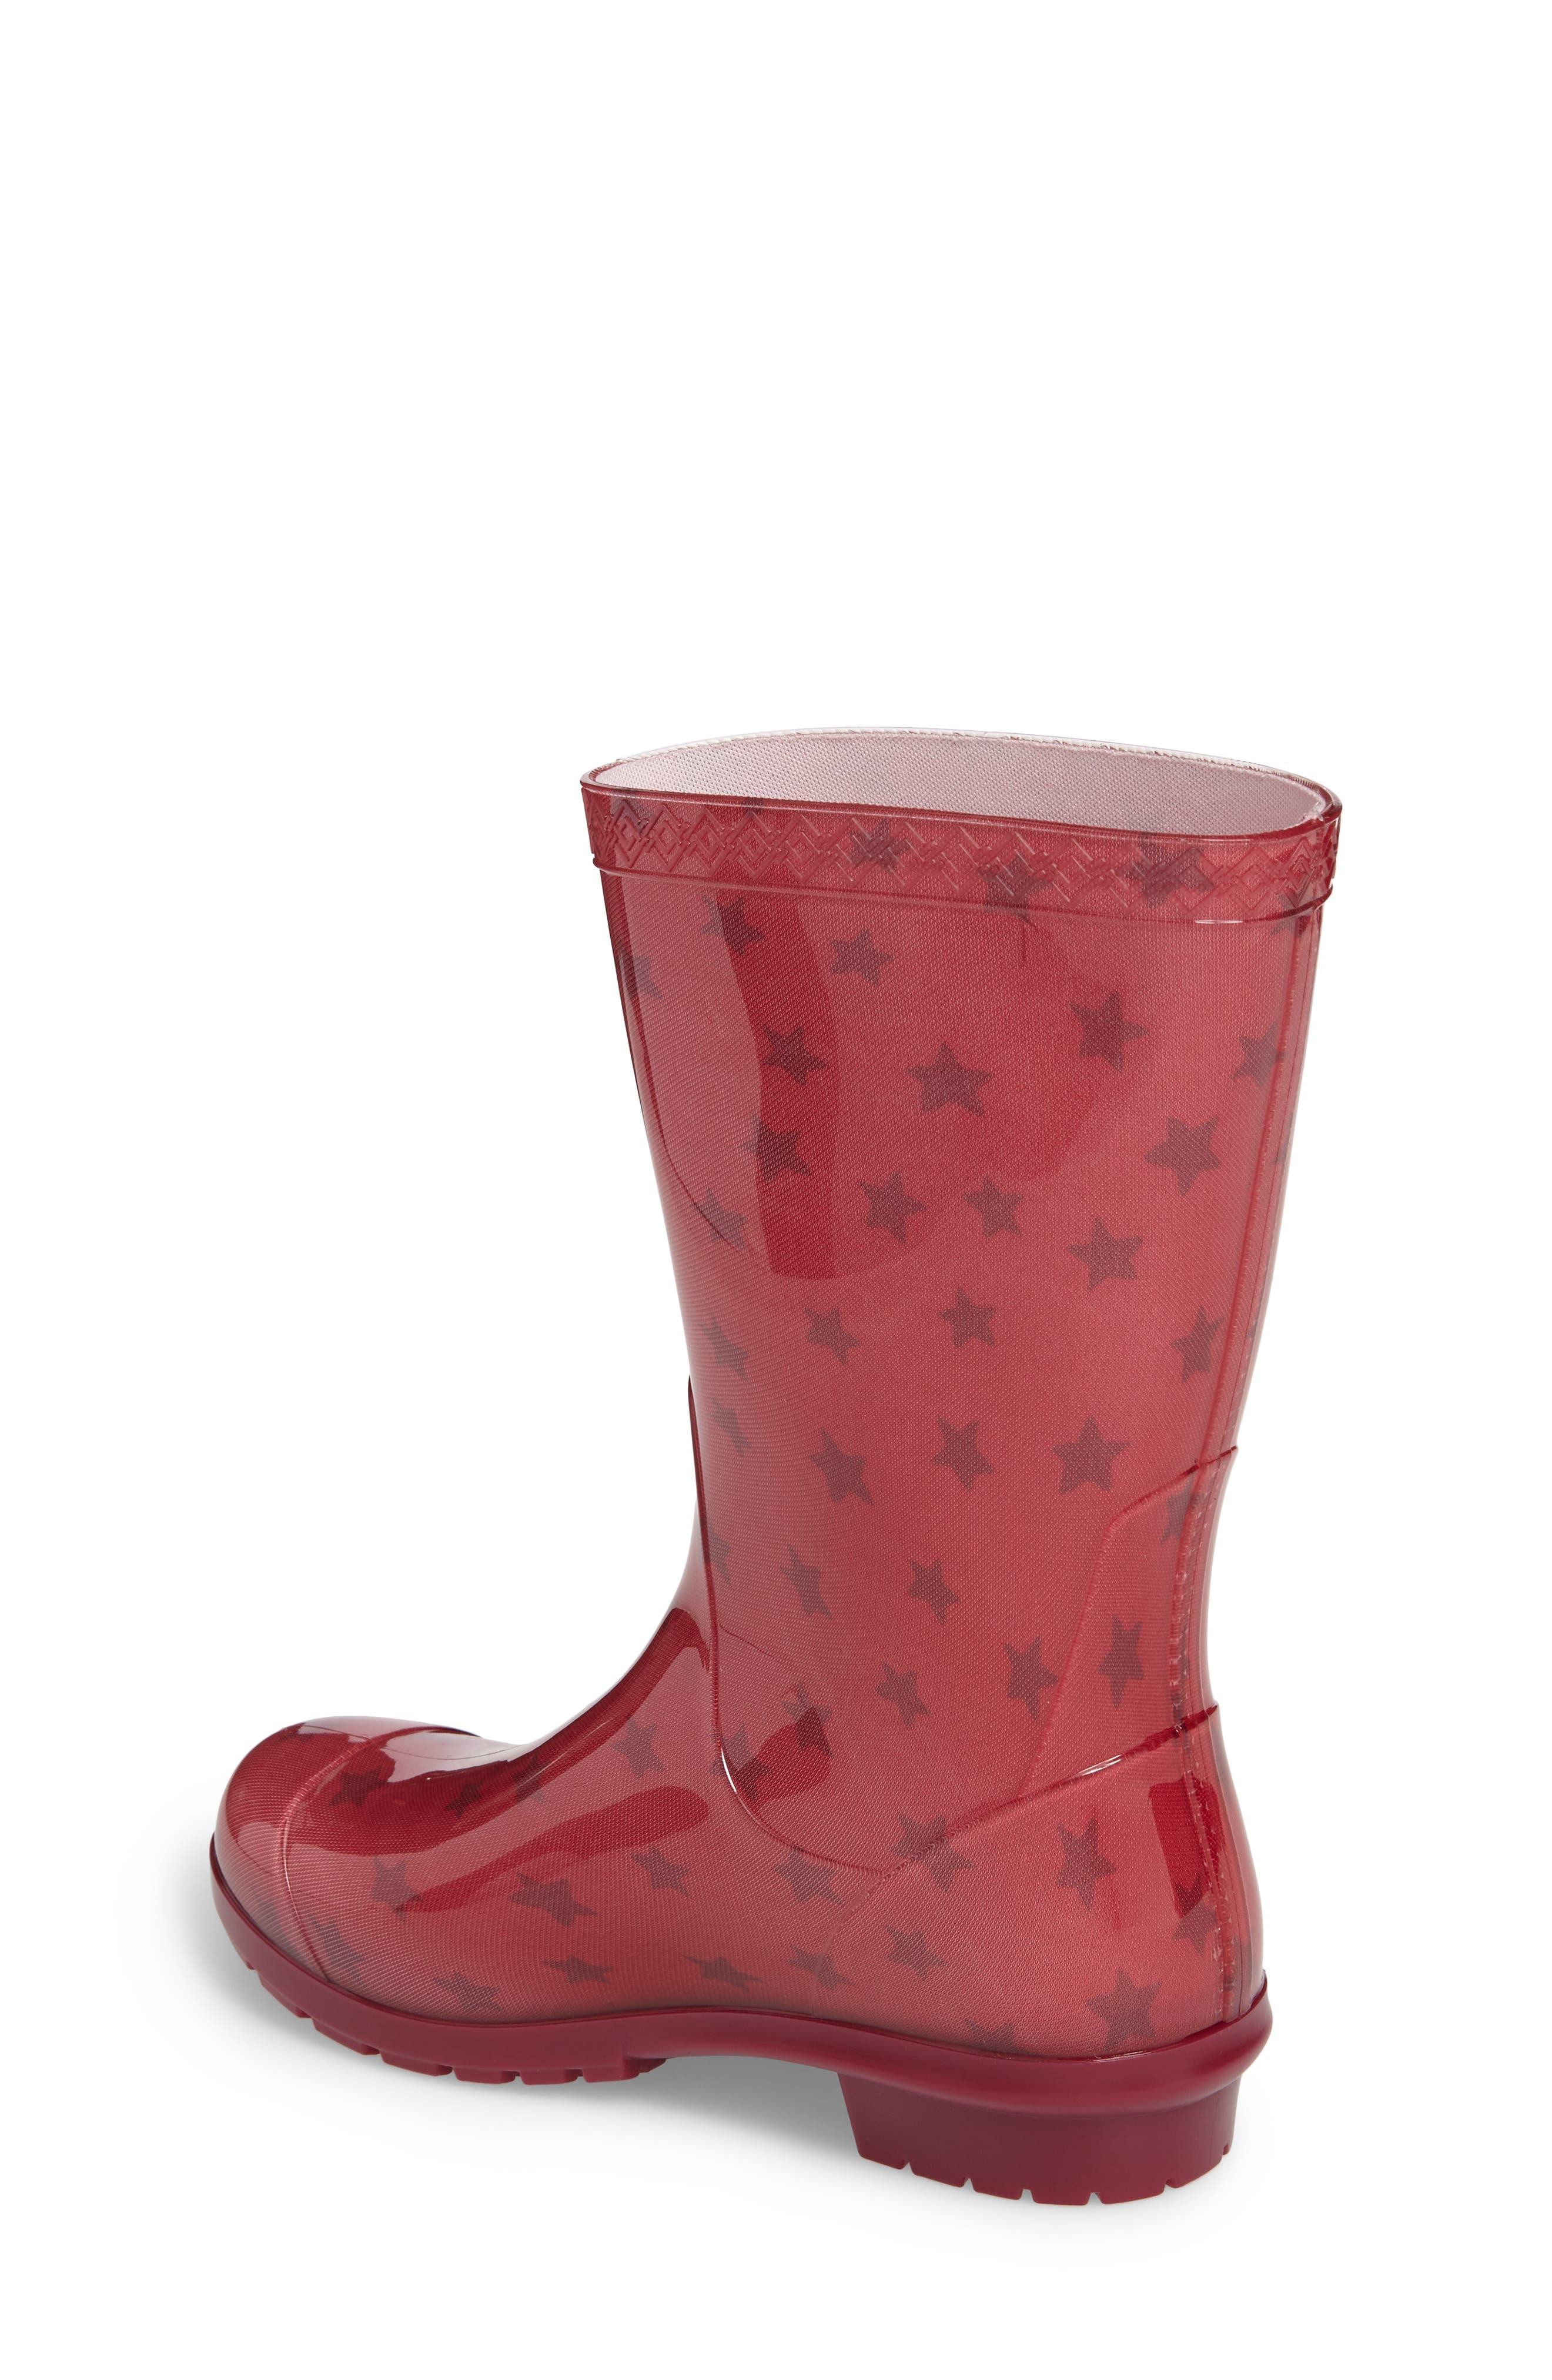 Alternate Image 2  - UGG® Raana Stars Waterproof Rain Boot (Little Kid & Big Kid)